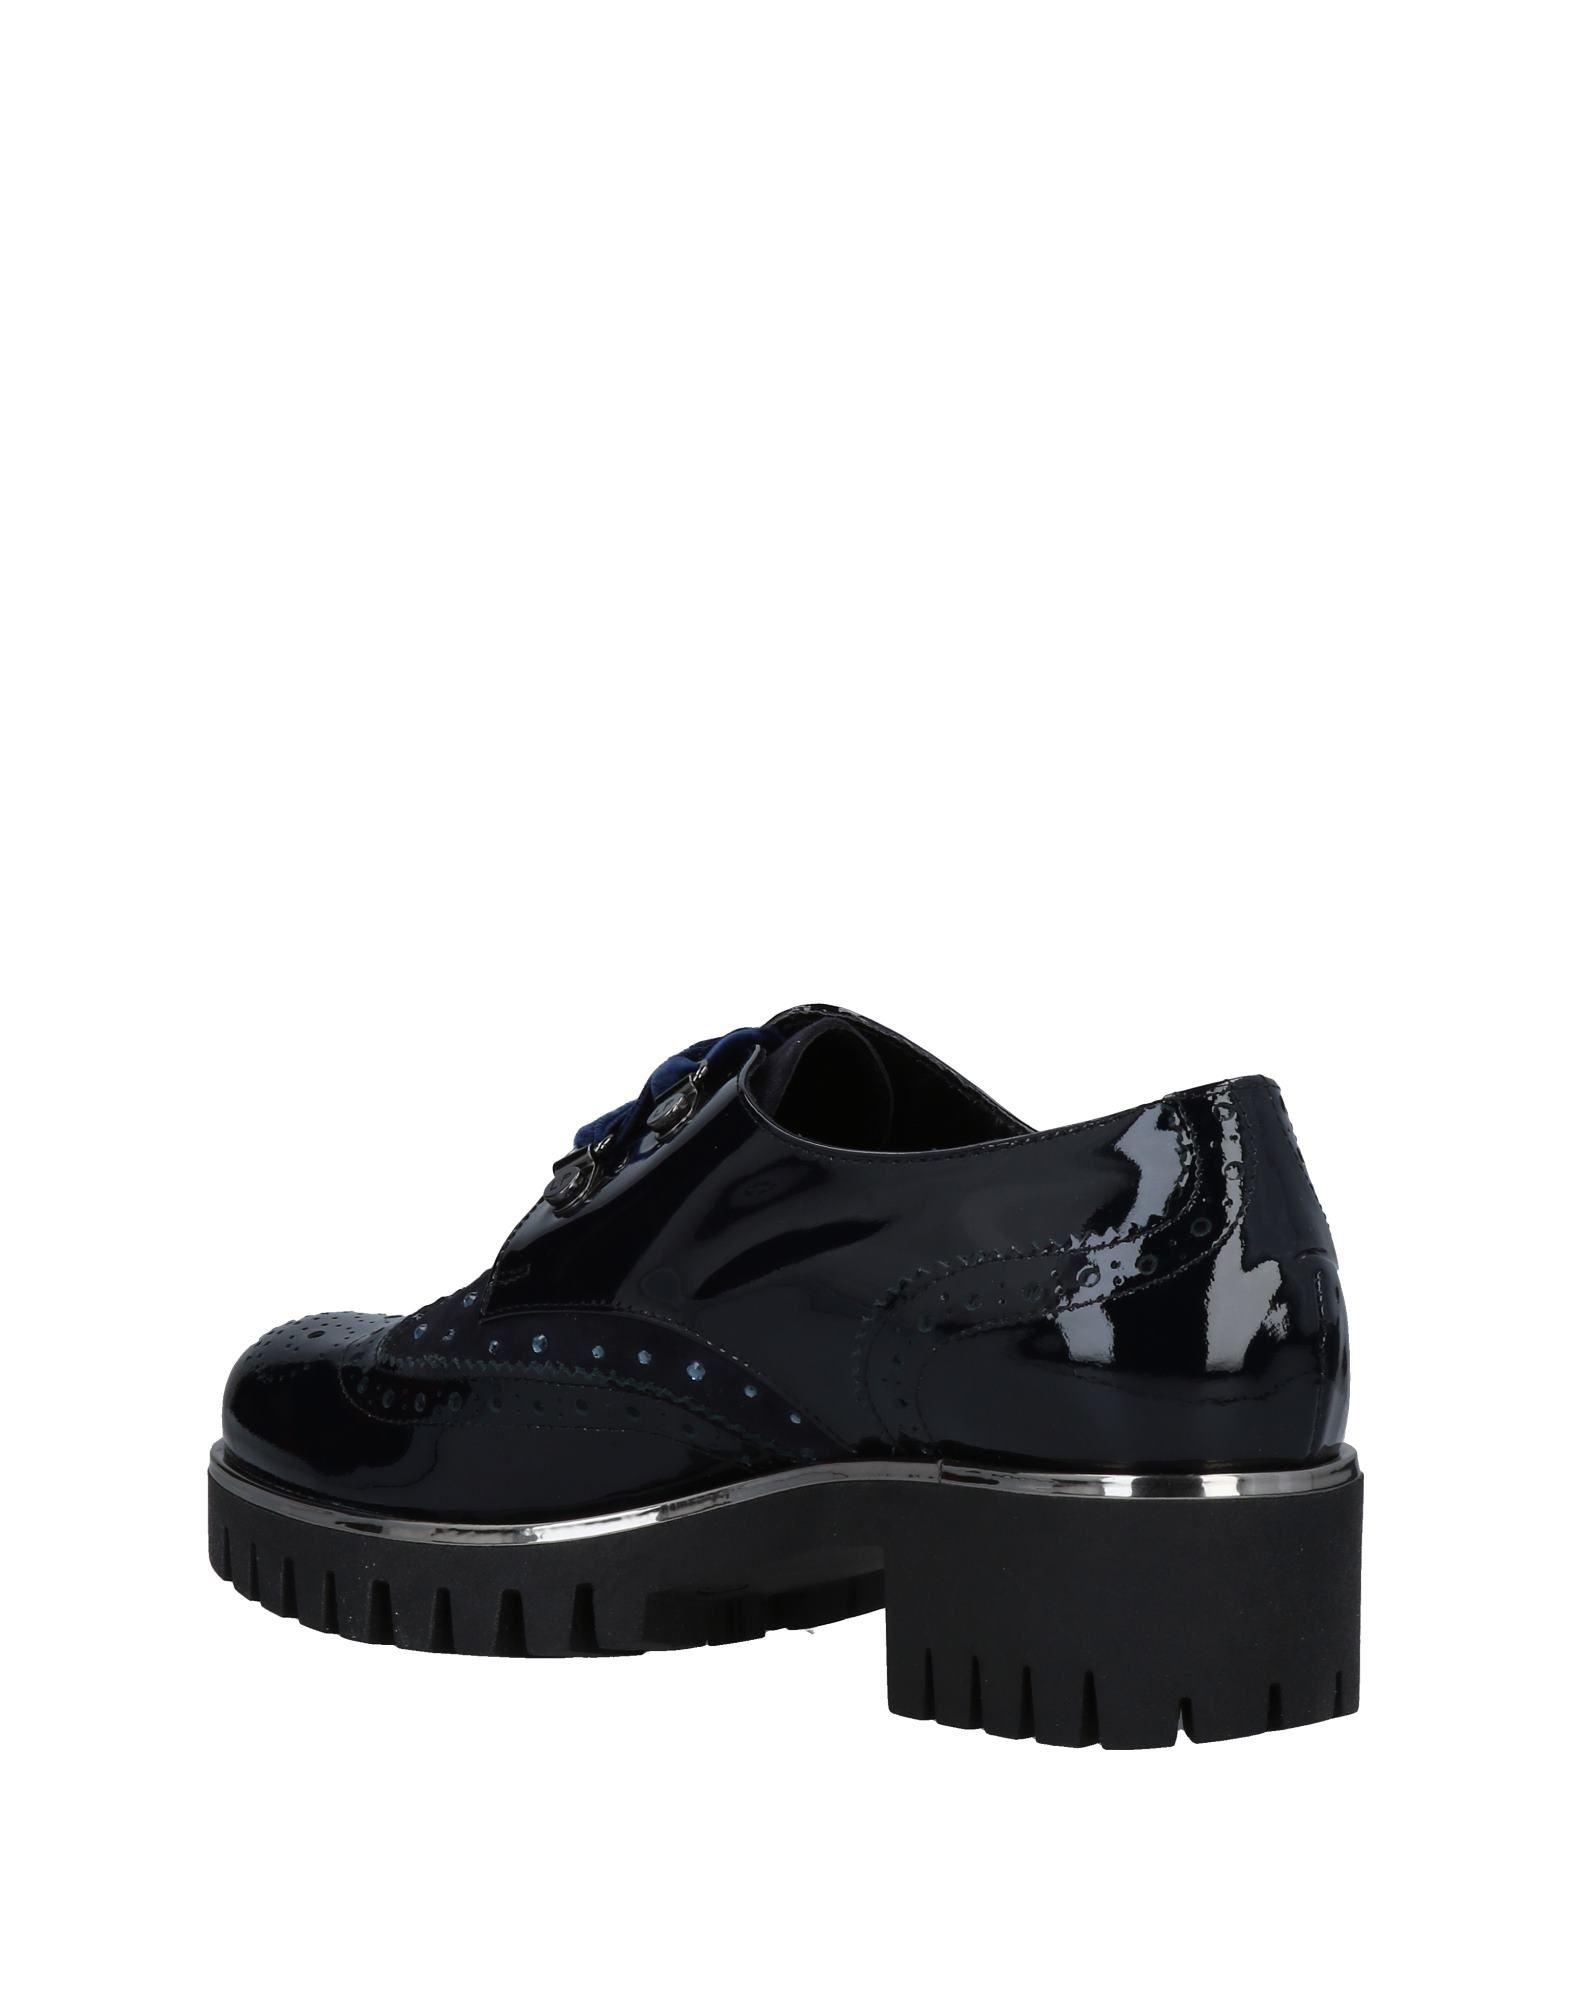 Stilvolle billige Schuhe  Loretta Pettinari Schnürschuhe Damen  Schuhe 11492140JA 024543